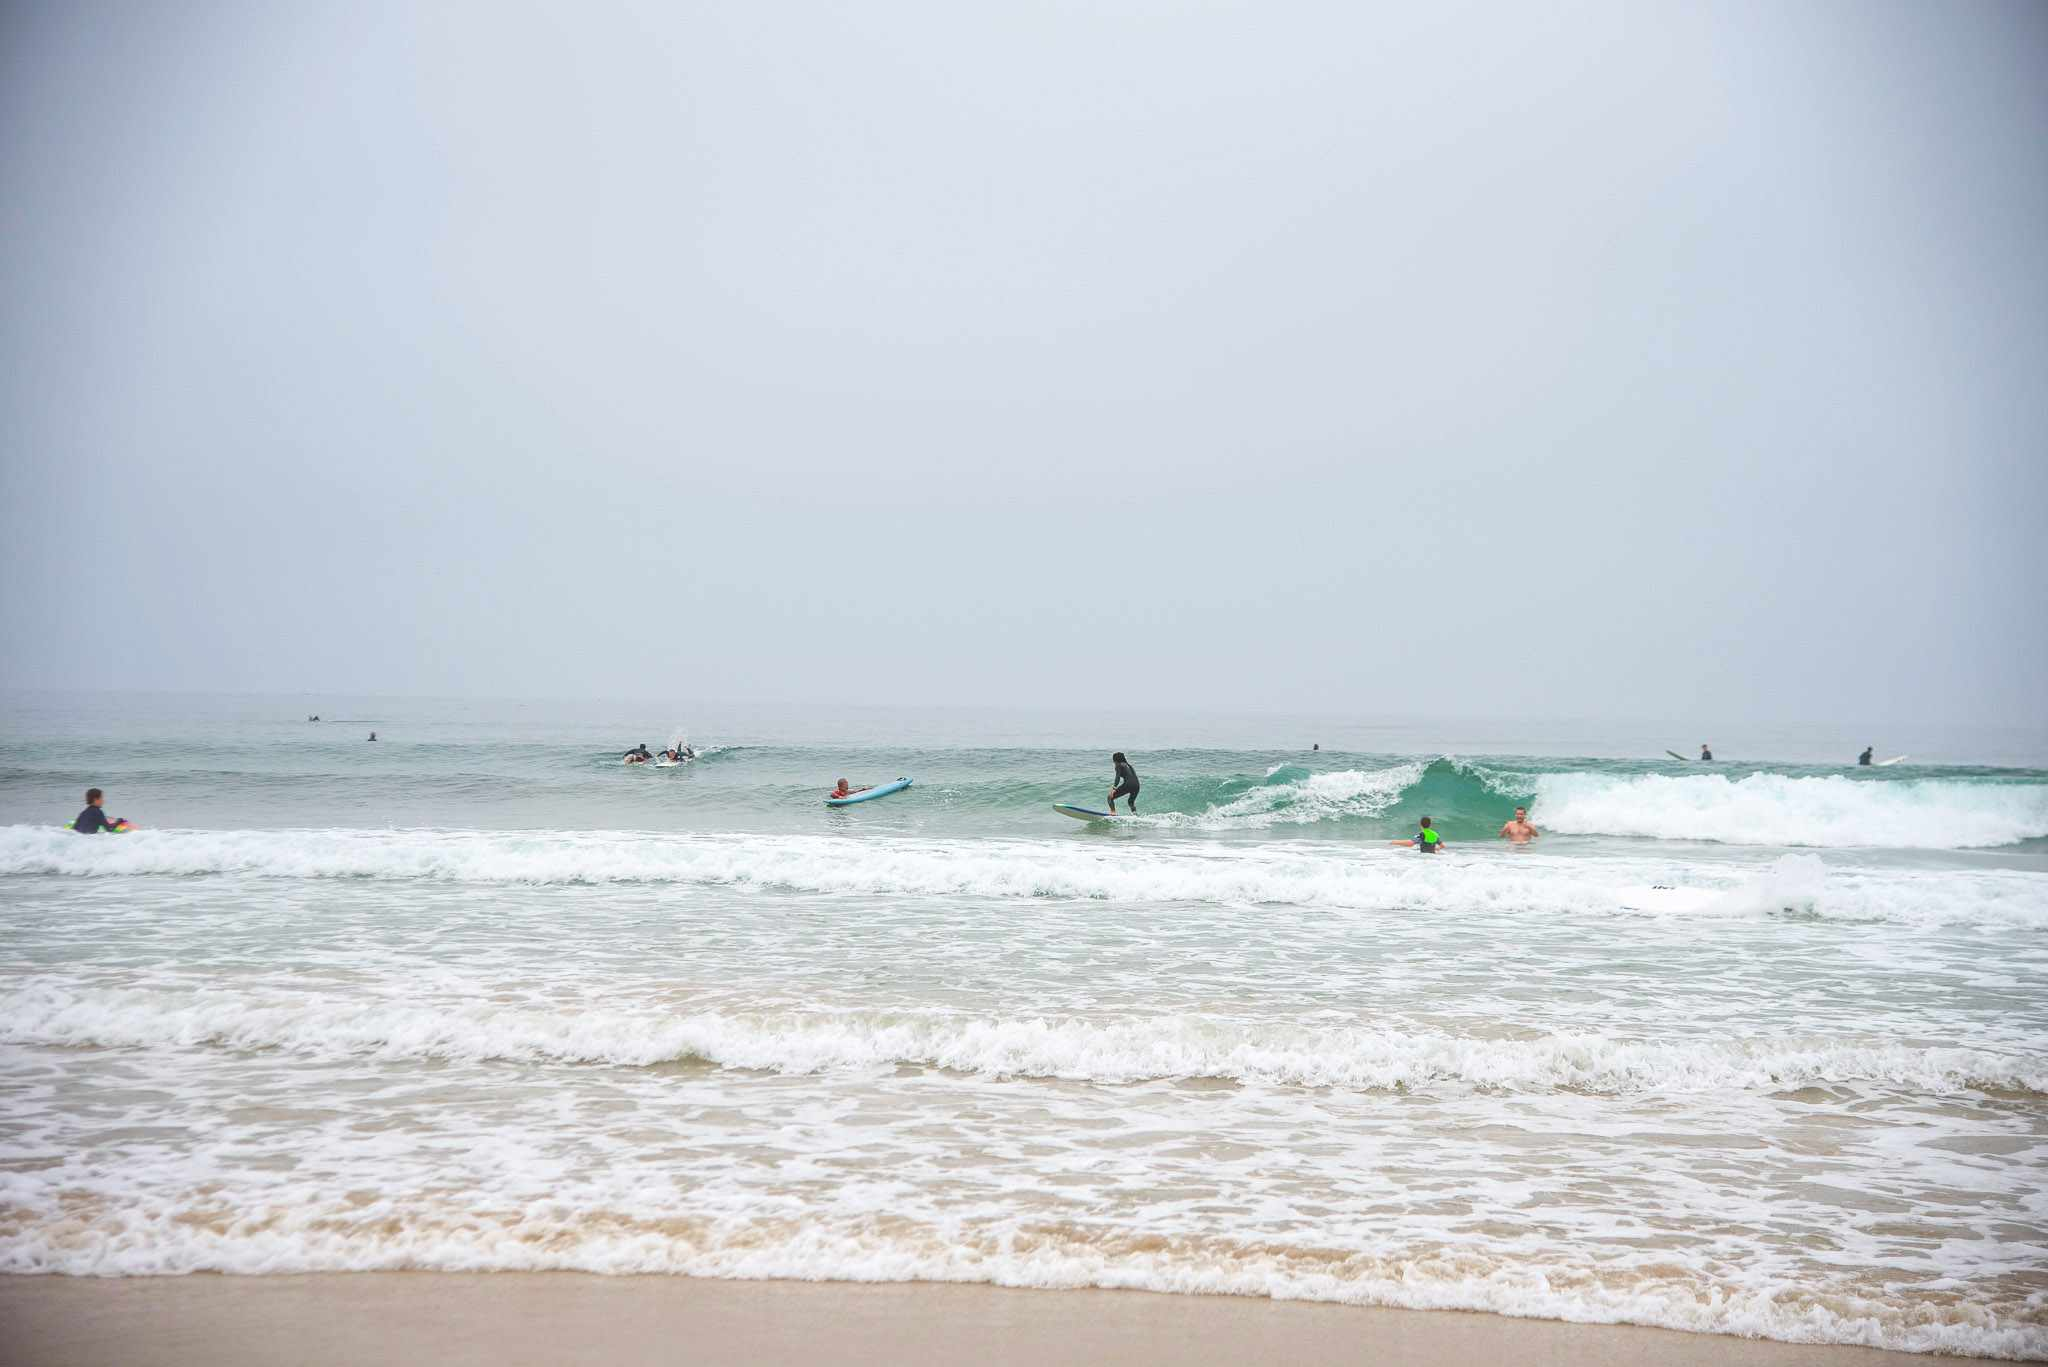 Surfers in San Diego